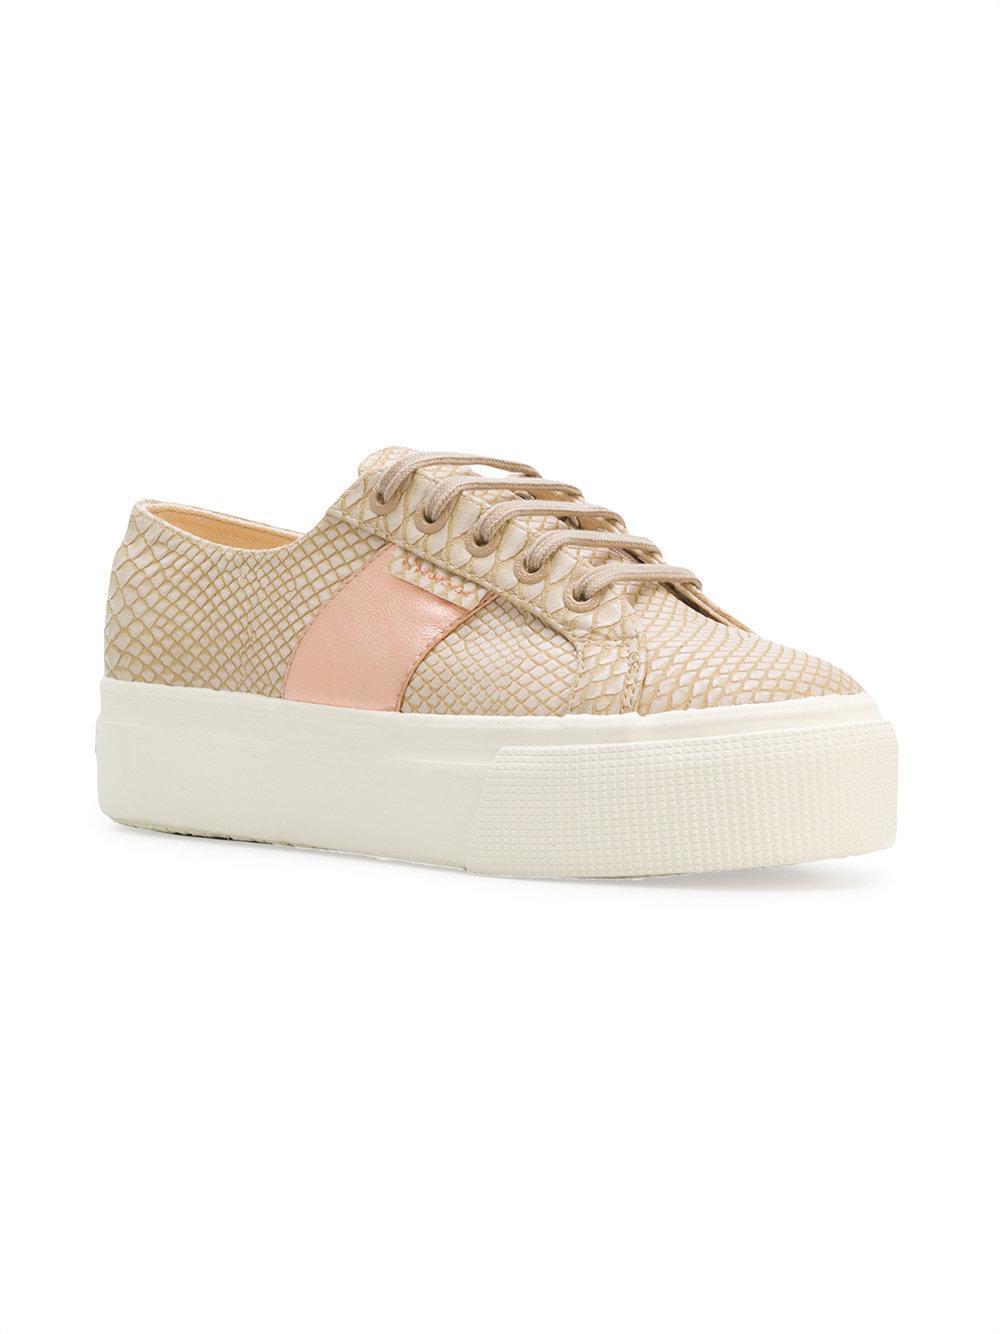 sale retailer bb7c9 a7766 superga-Nude-Neutrals-Platform-Sneakers.jpeg